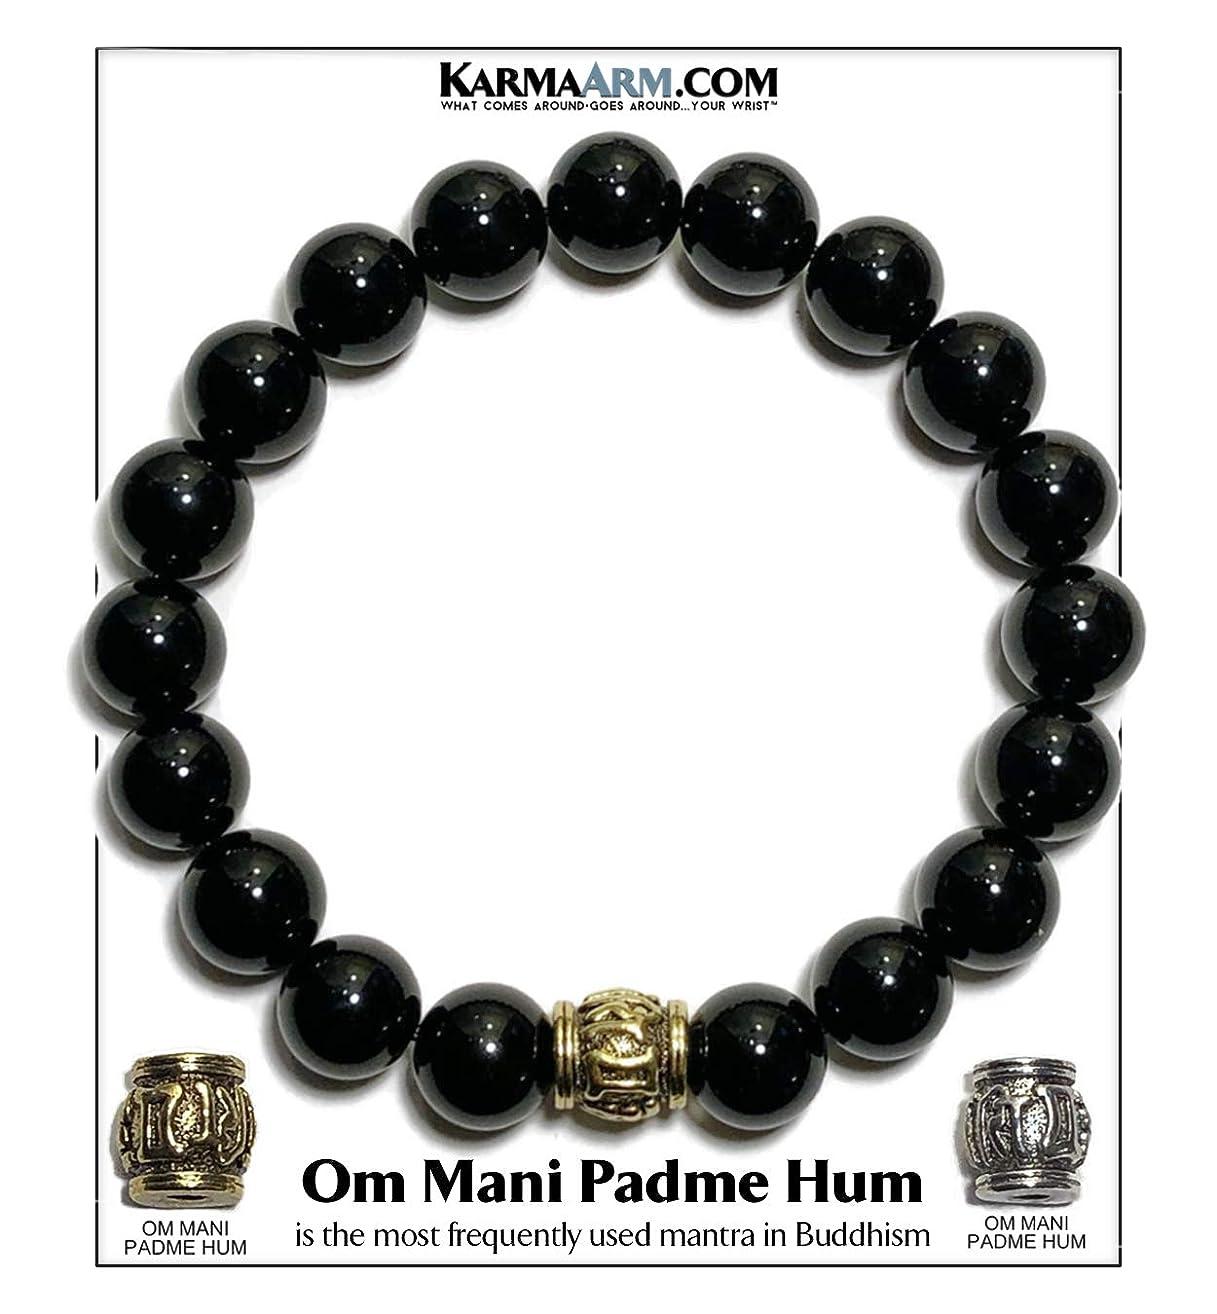 Tibetan Buddhist Mantra Prayer Wheel Bracelet   Om Mani Padme Hum   Yoga Chakra Bracelet   Boho Zen Meditation Self-Care Wellness Jewelry   10mm Black Onyx